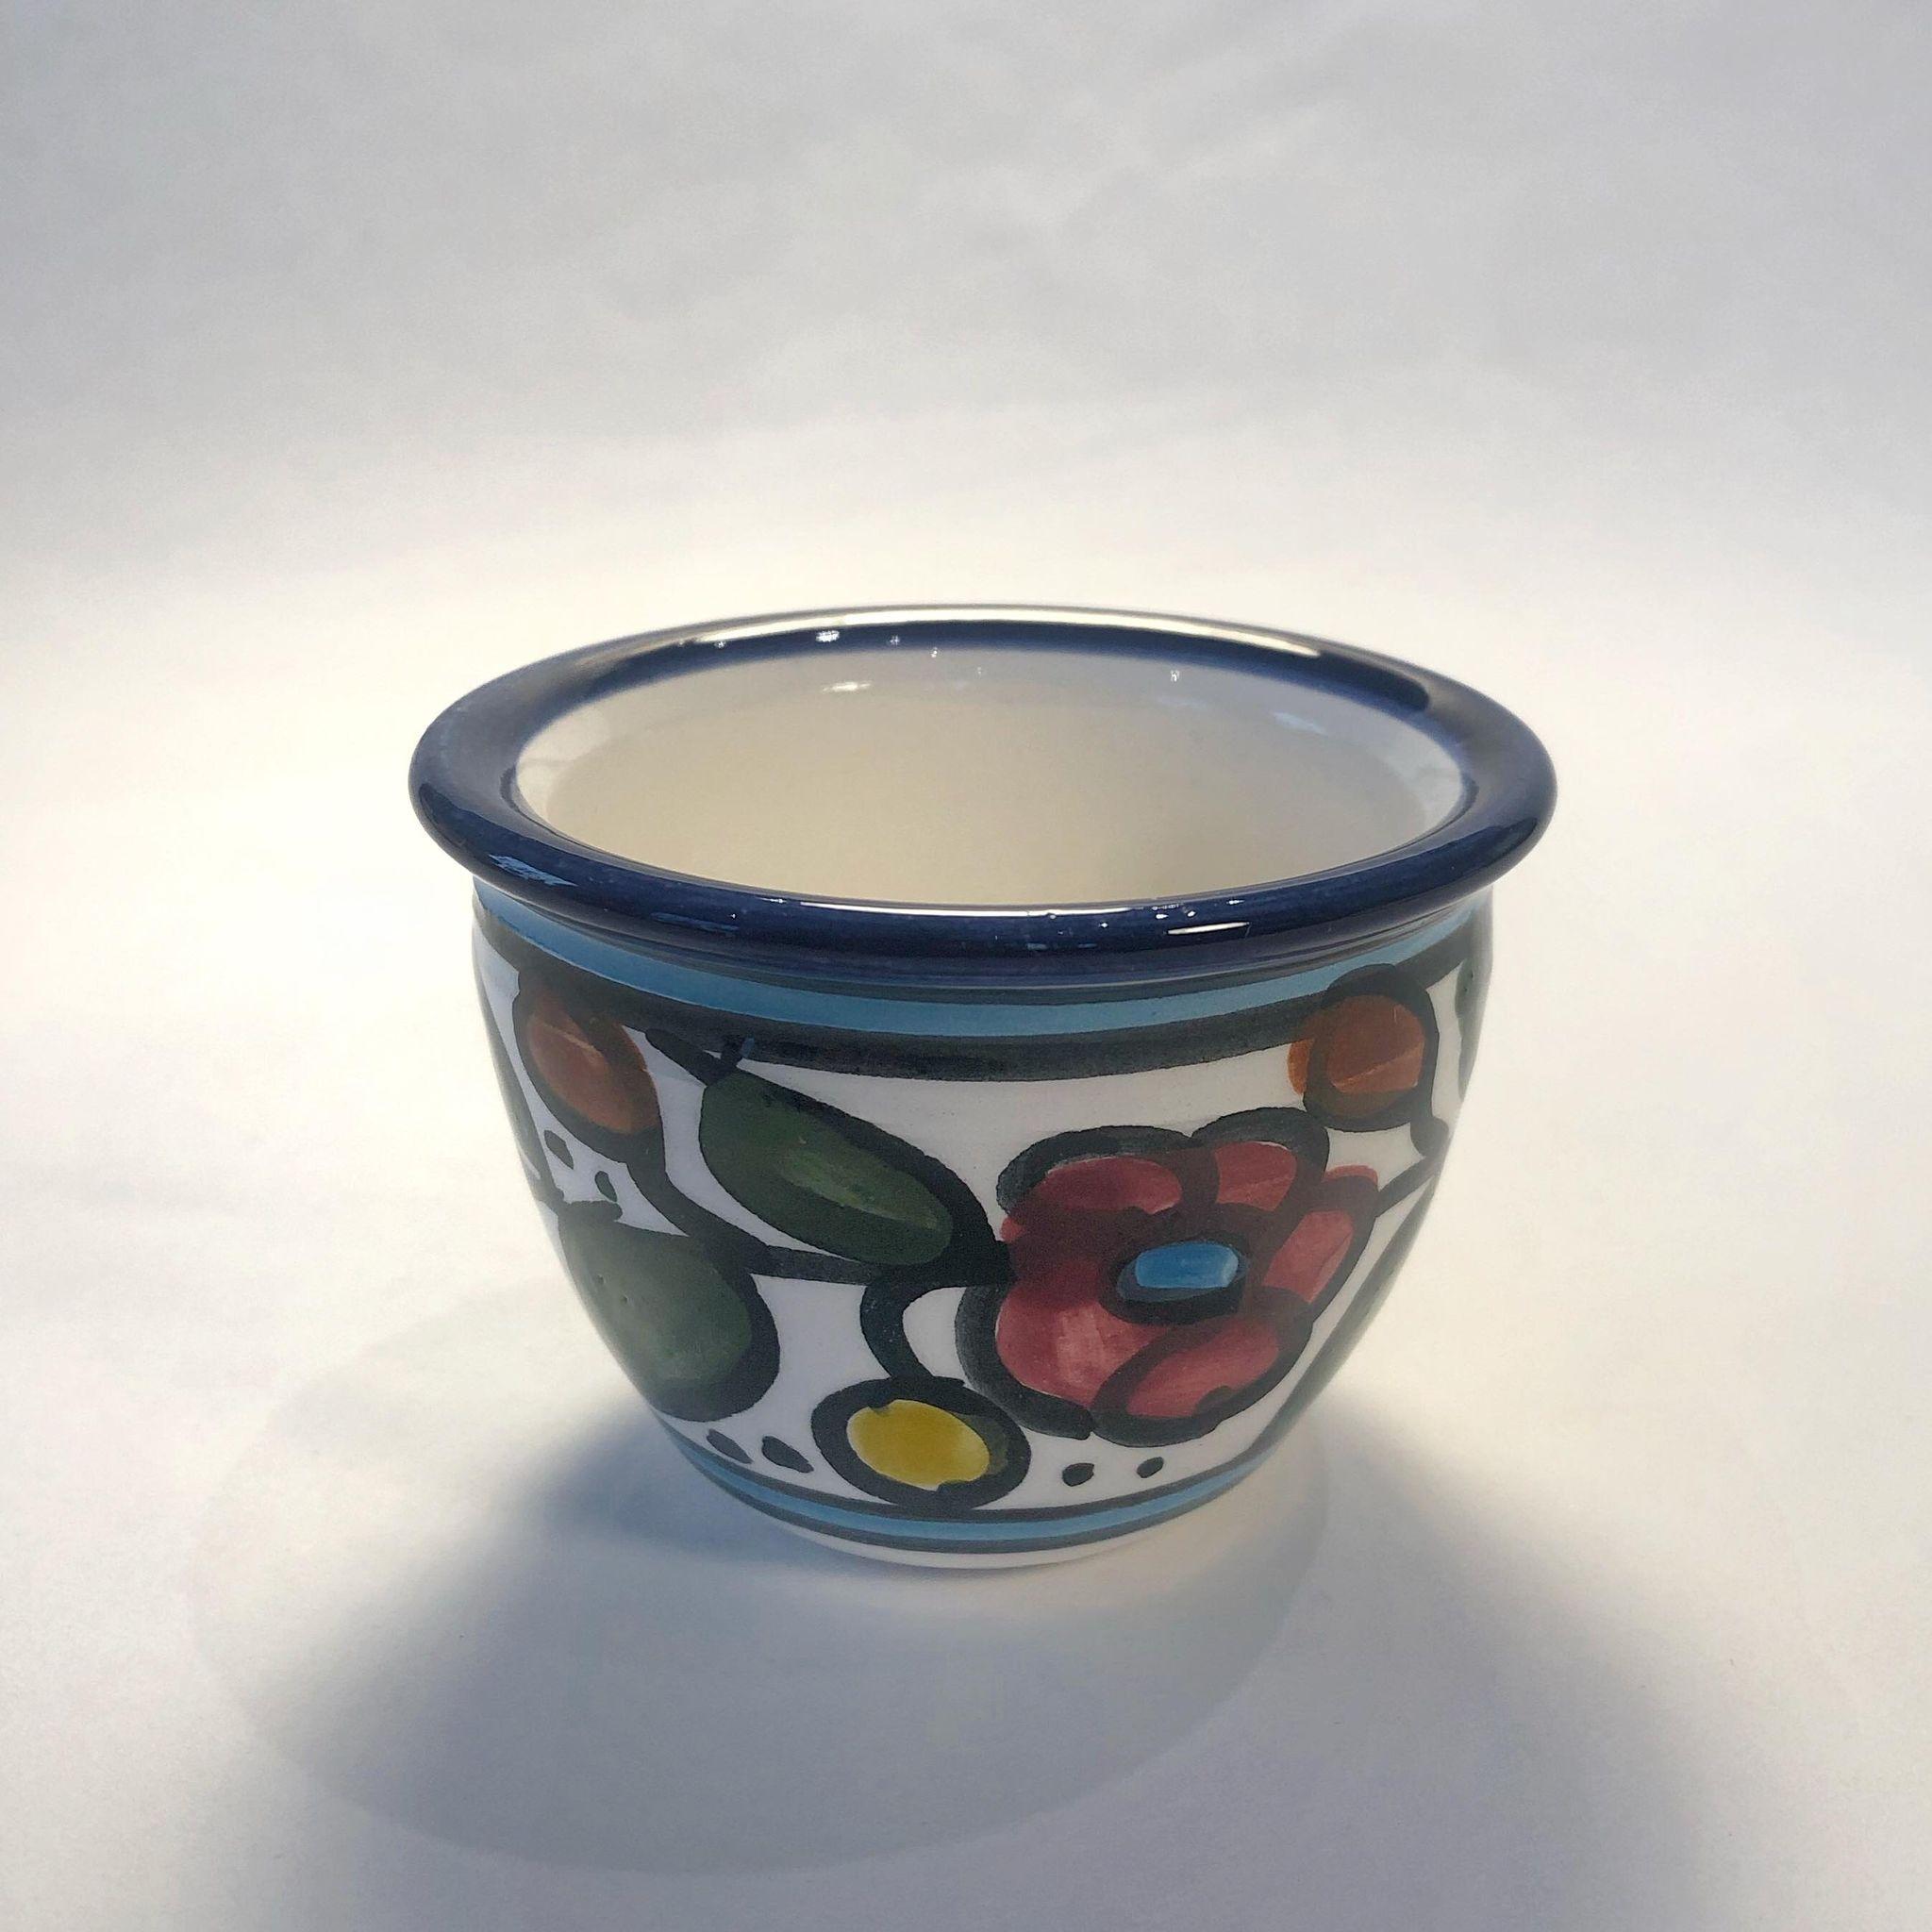 Arabisk kaffekopp, keramikk. Flerfarget